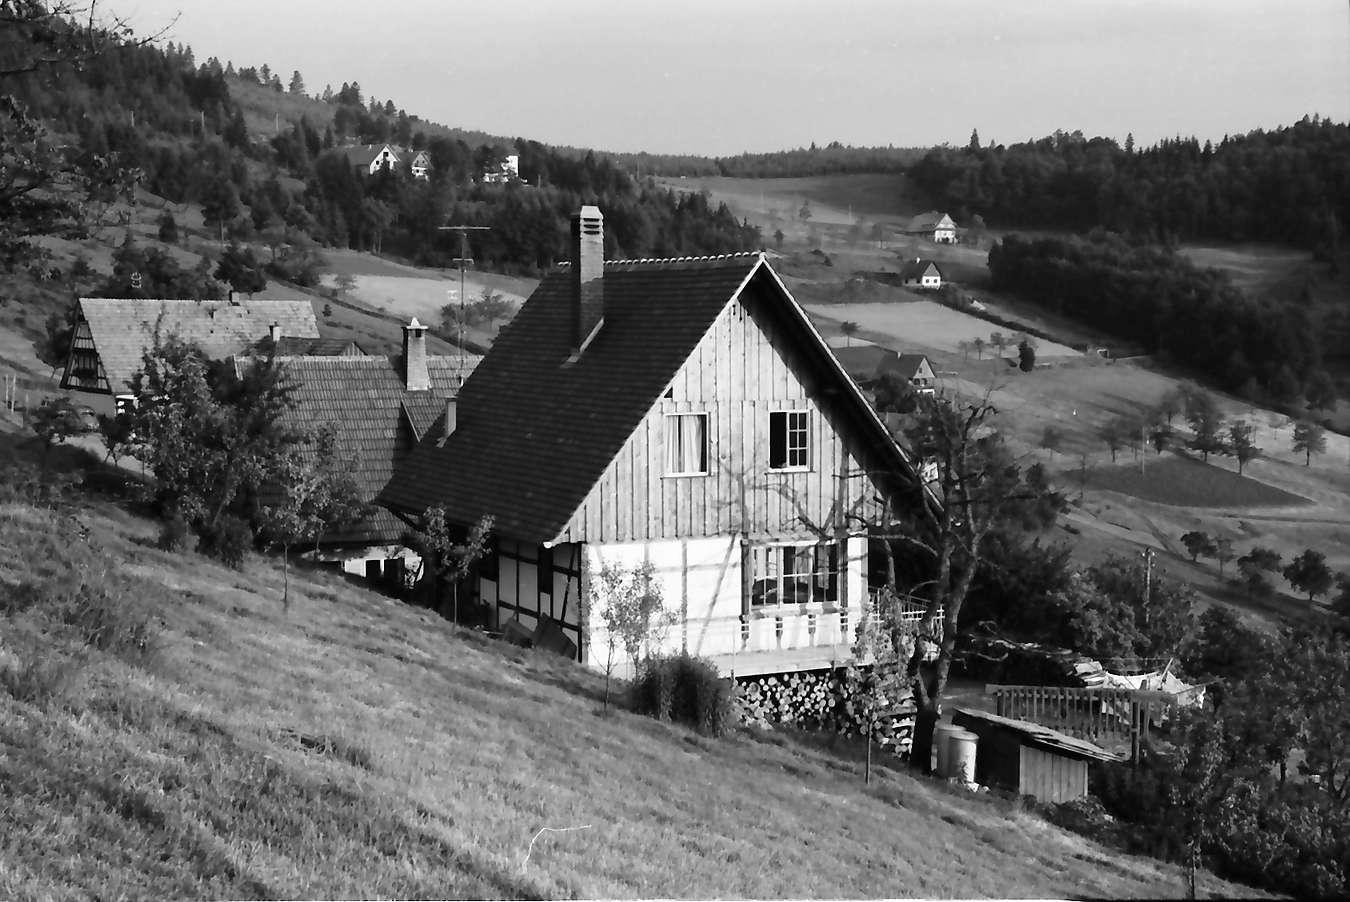 Sasbachwalden: Haus am Hang, Bild 1